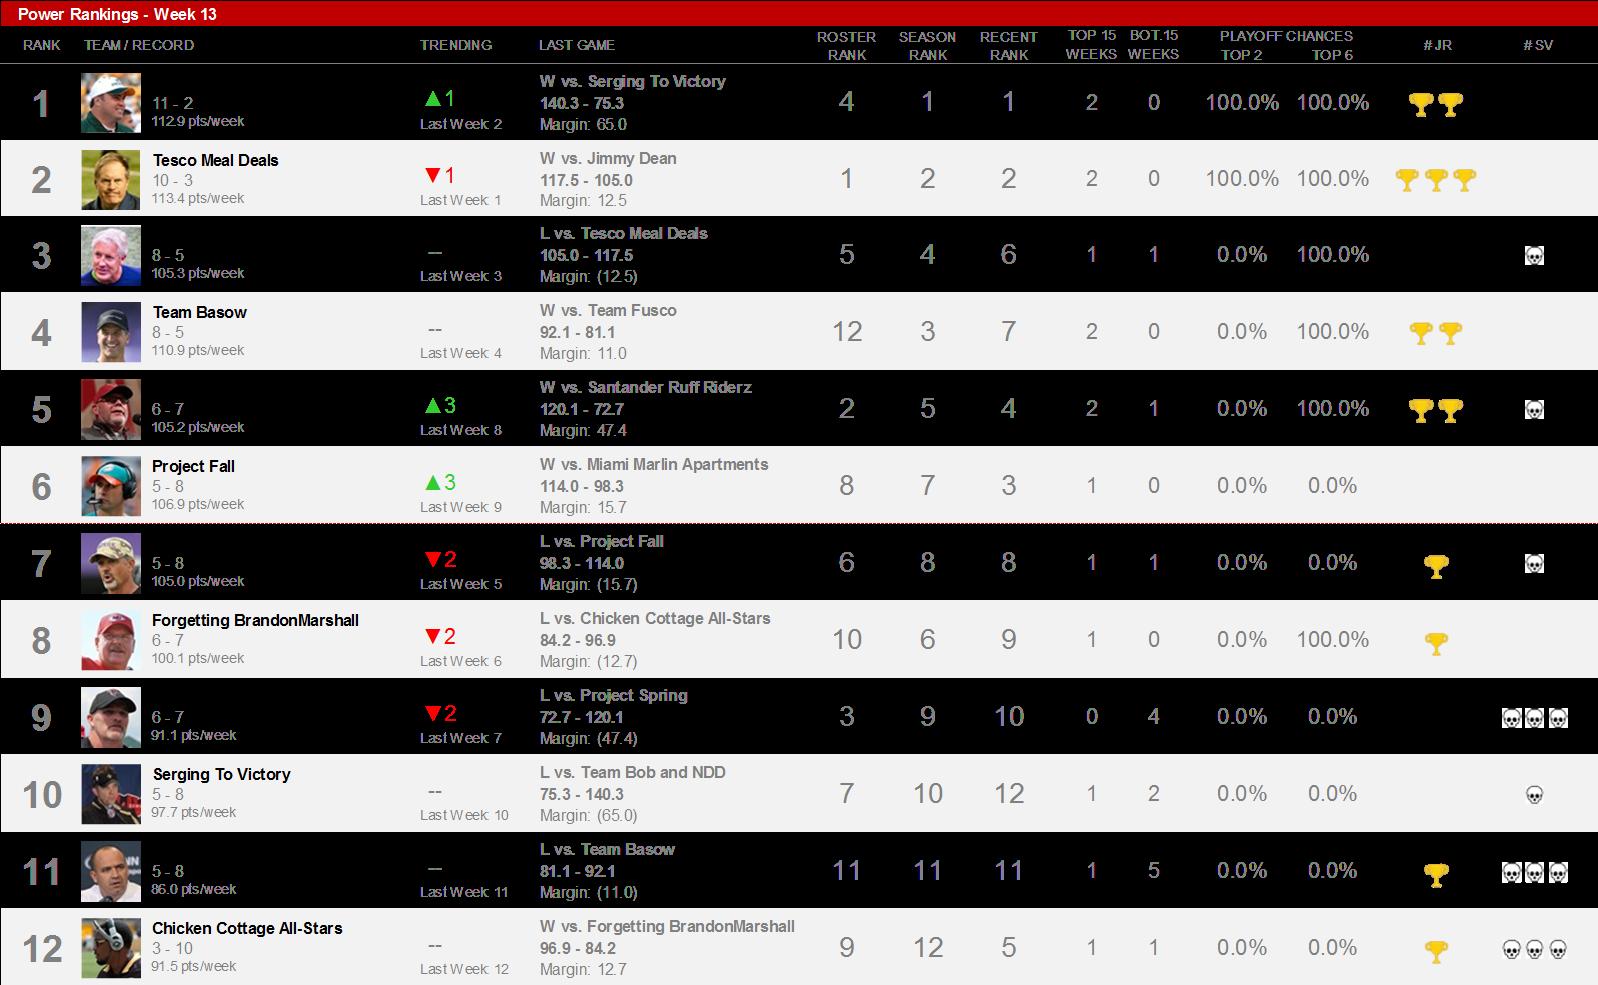 GitHub - liding103/fantasy-football-power-rank: Automated